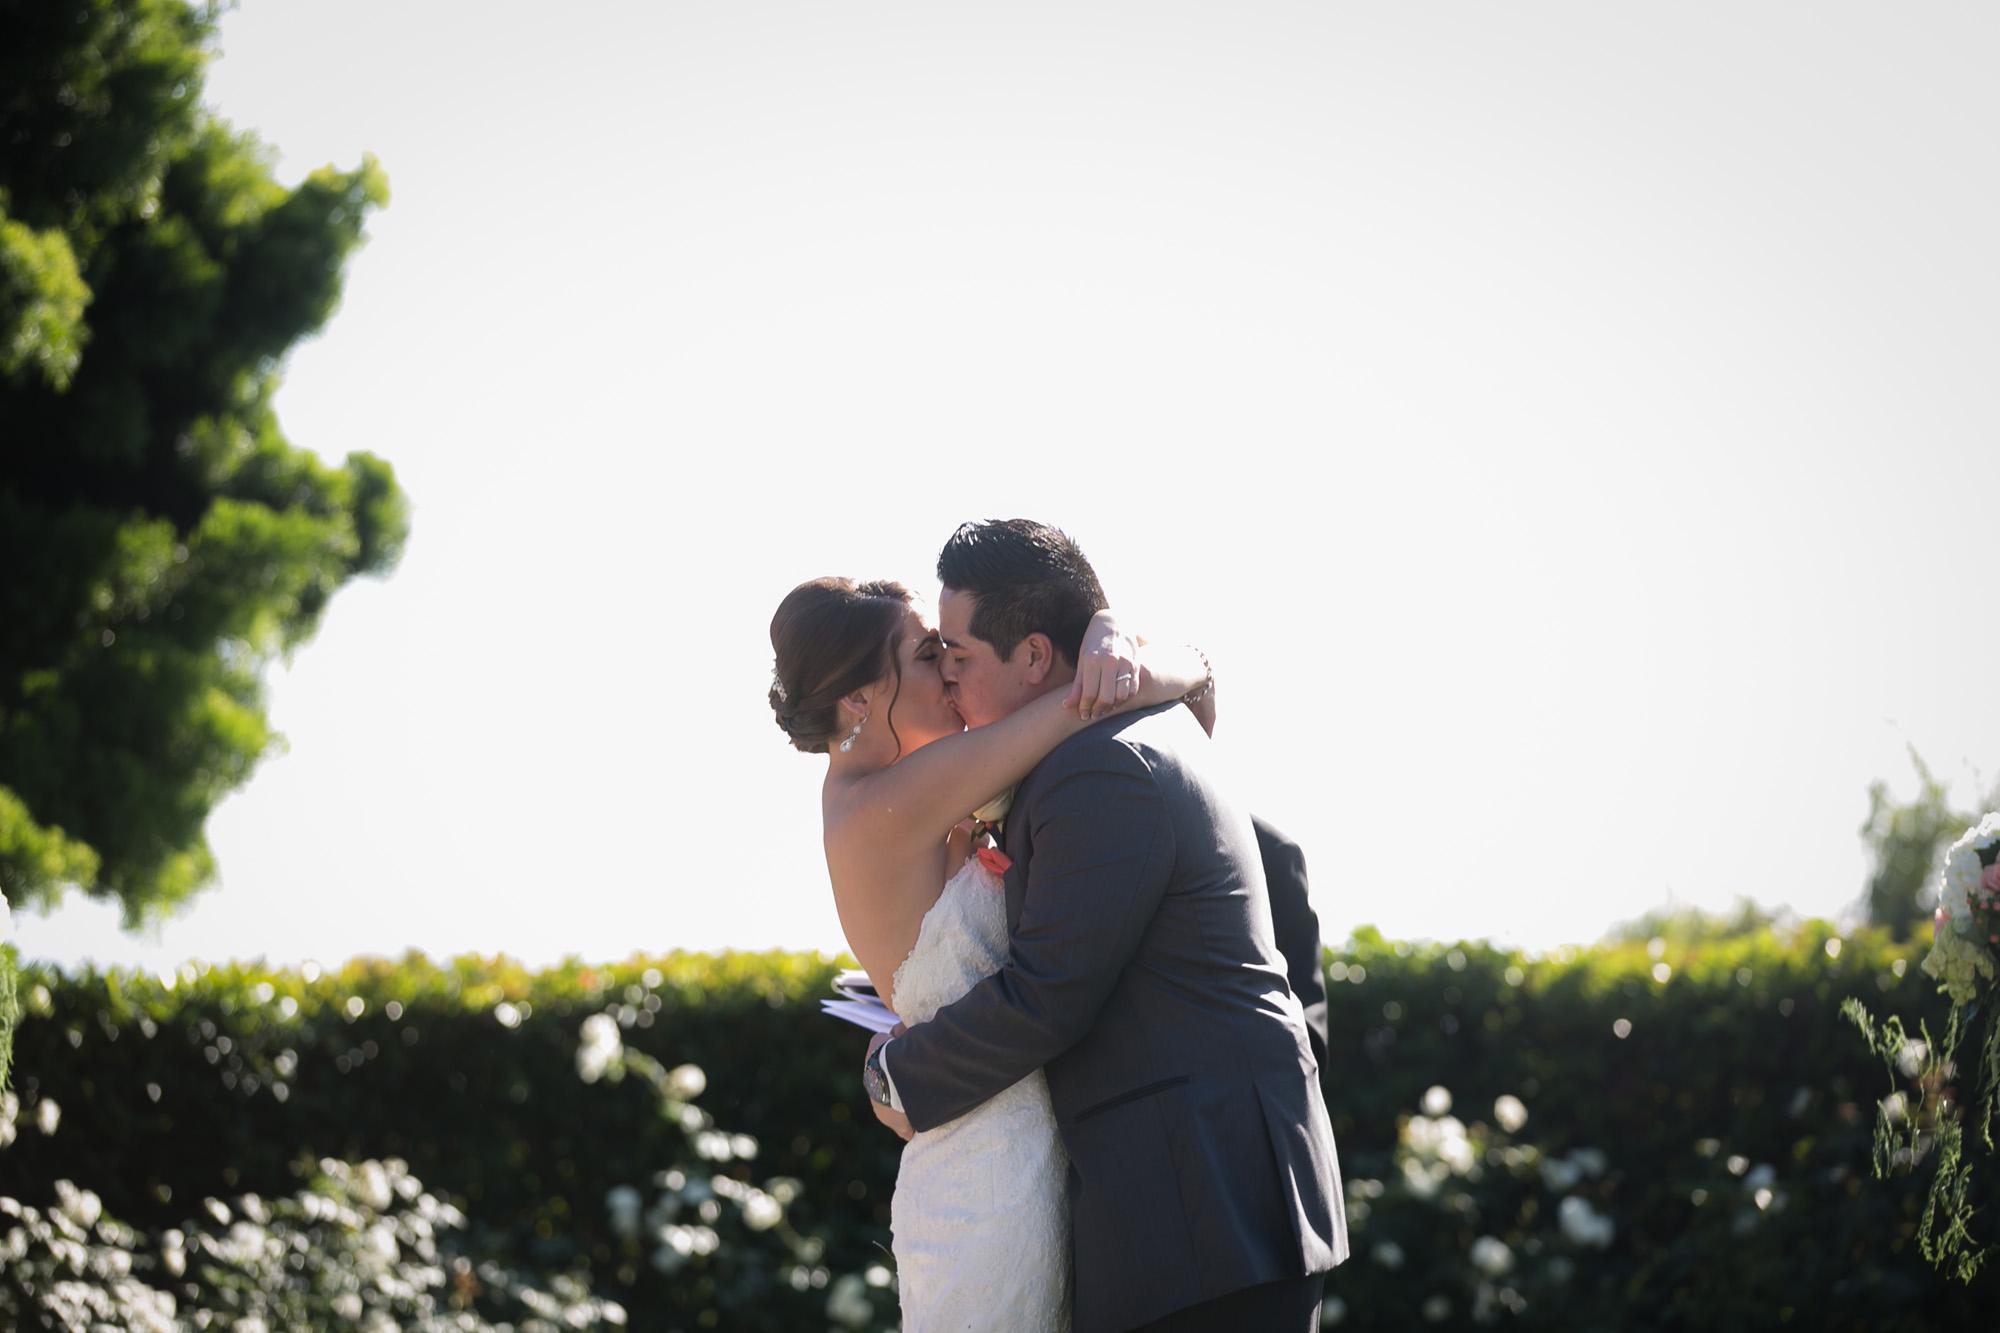 Geoff Kowalchuk BM Wedding Photography-015.jpg